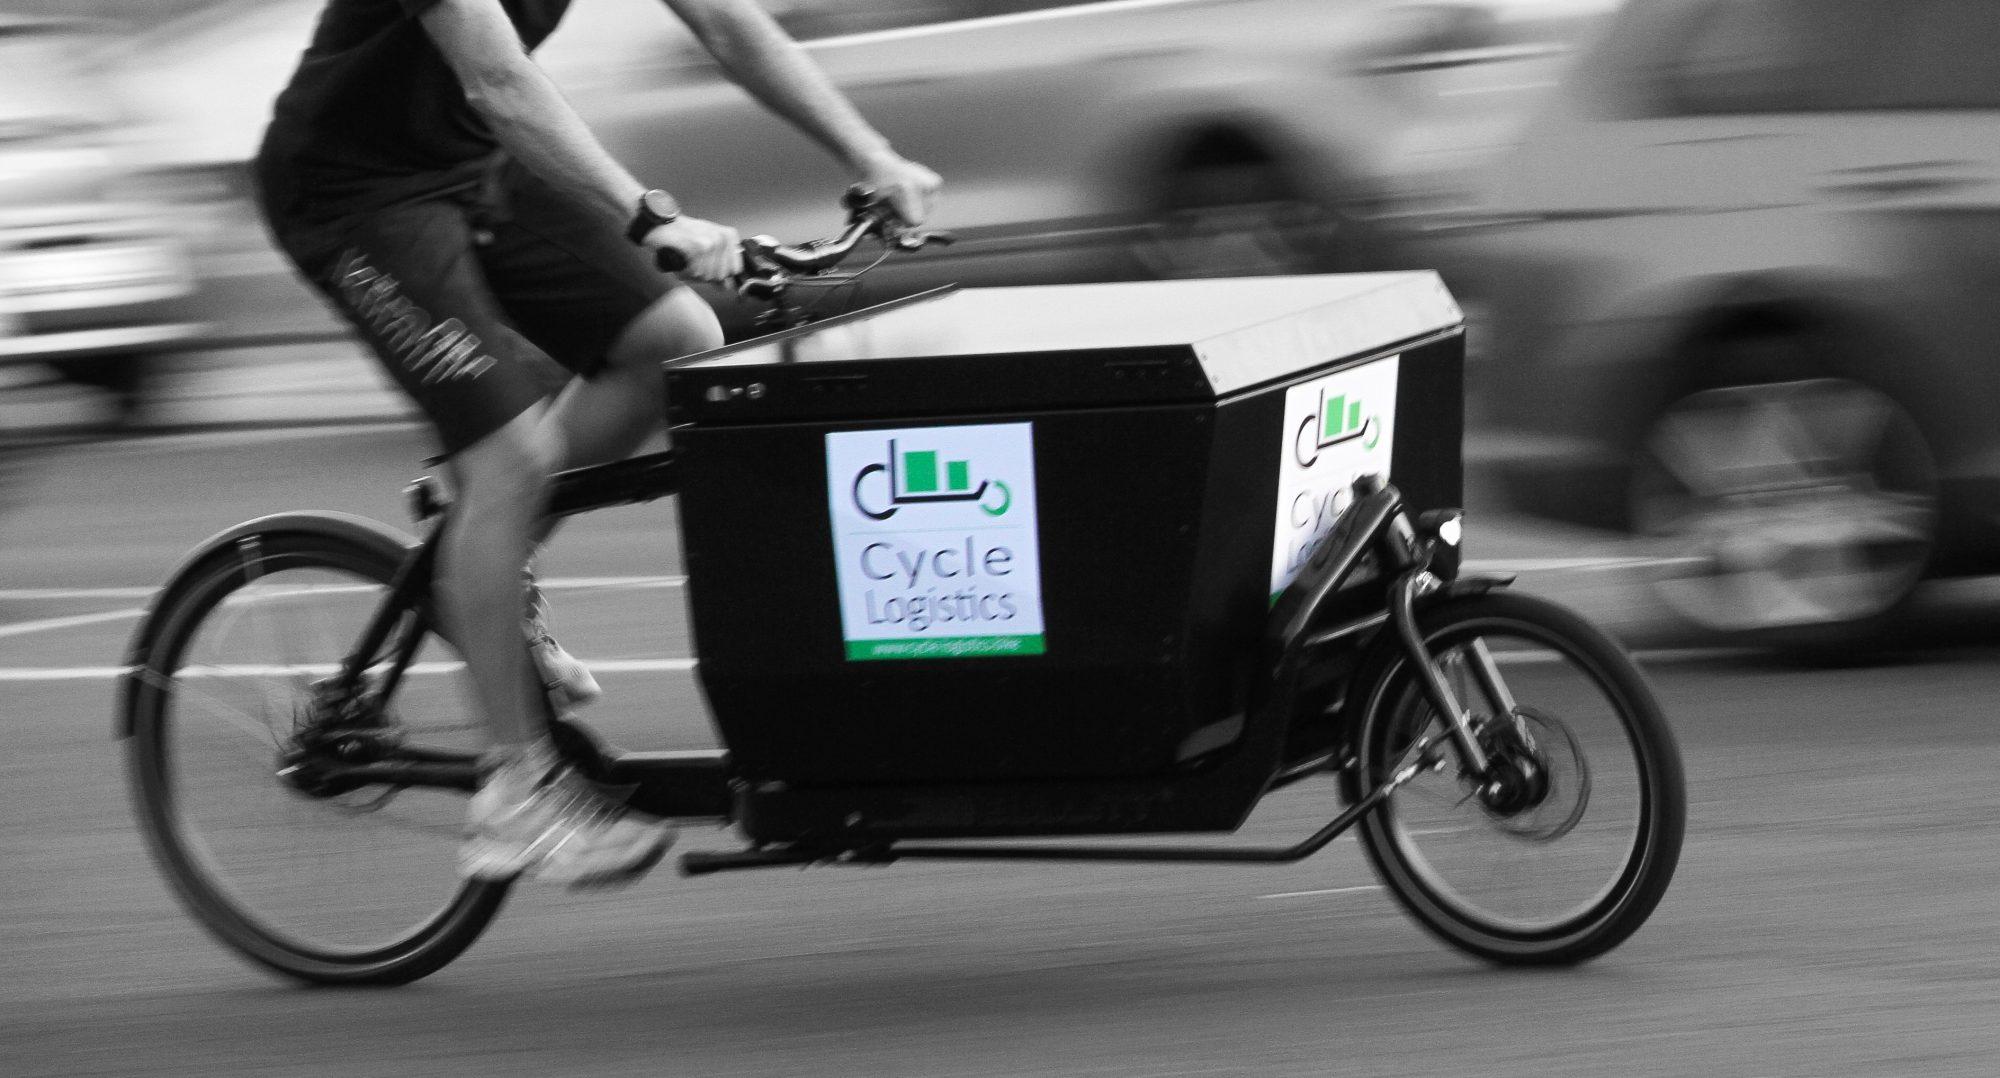 Cycle Logistics CL GmbH